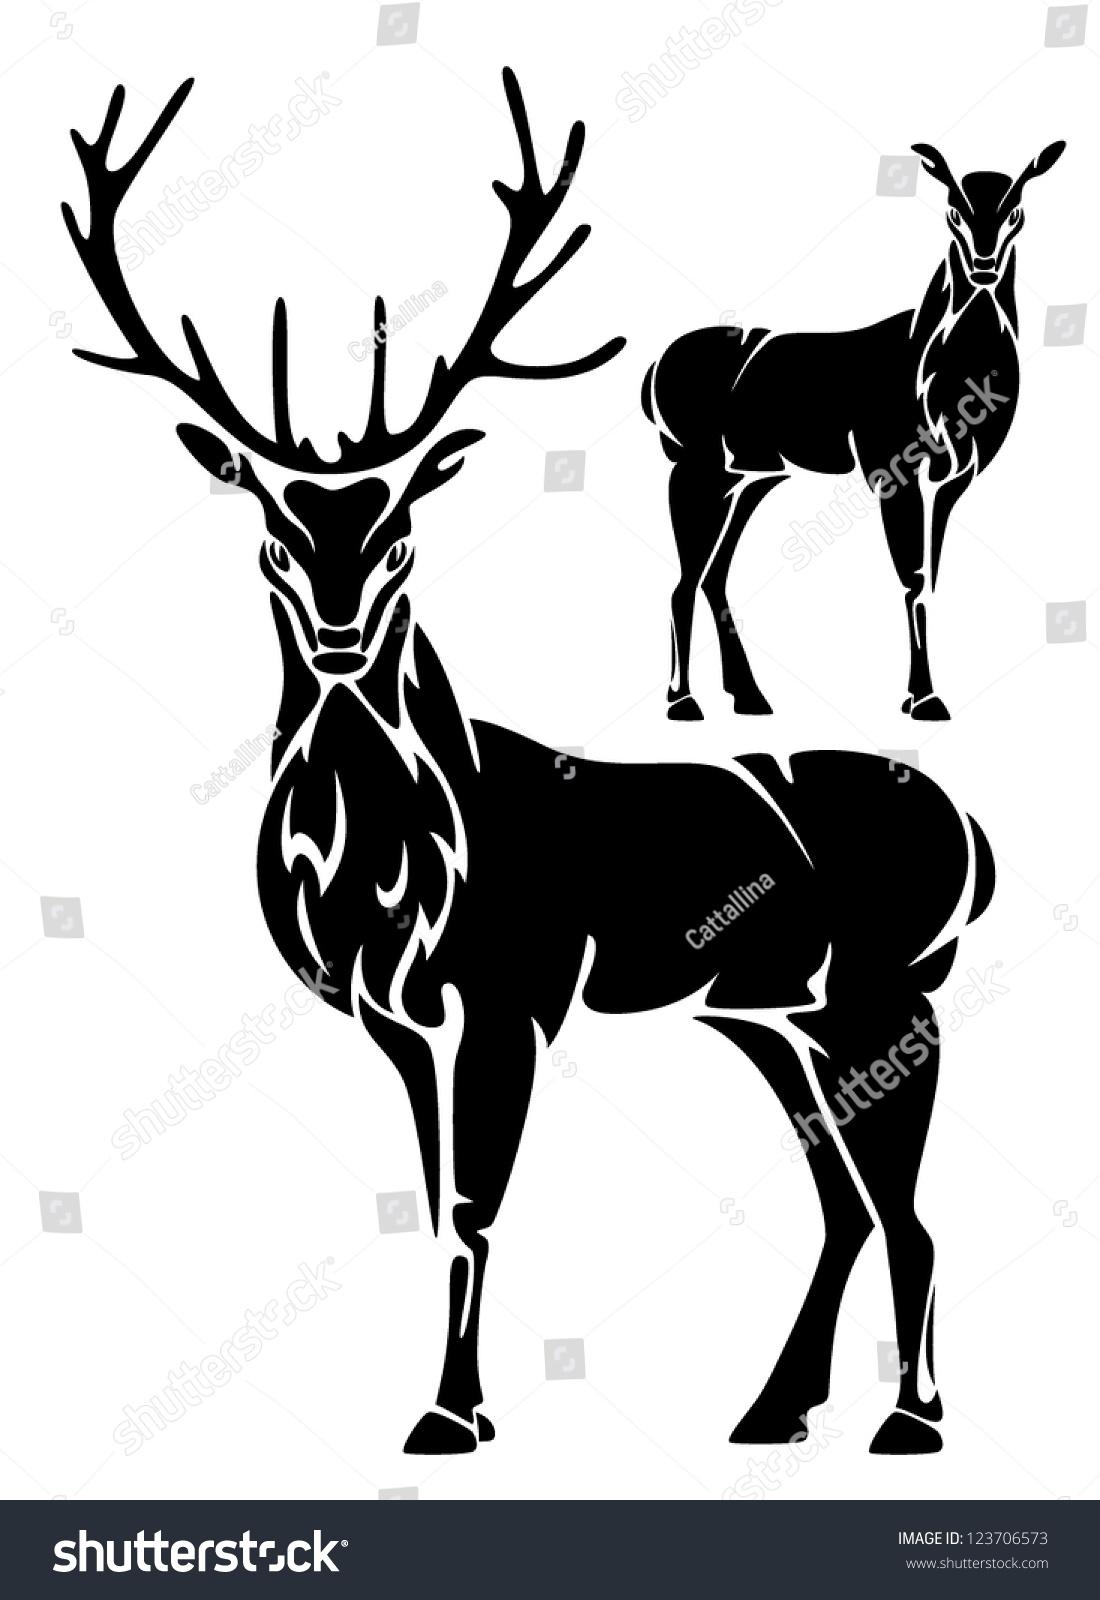 Deer illustration black and white - photo#6